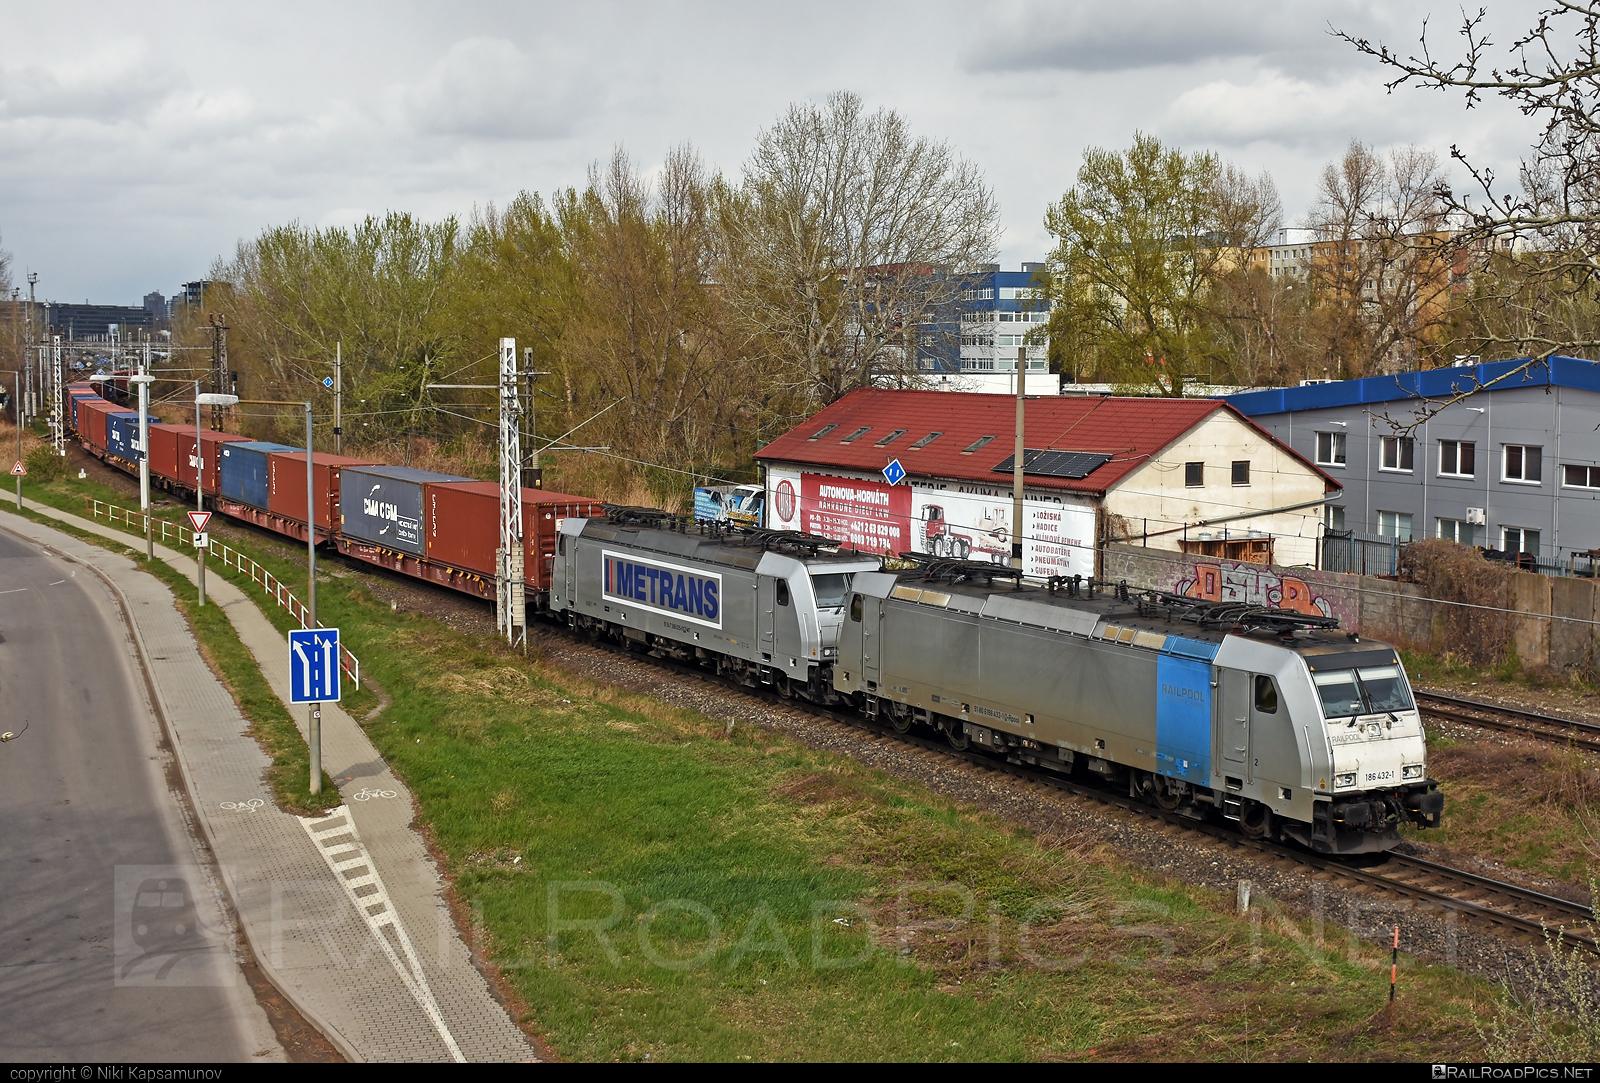 Bombardier TRAXX F140 MS - 186 432-1 operated by METRANS Rail s.r.o. #bombardier #bombardiertraxx #flatwagon #hhla #metrans #metransrail #railpool #railpoolgmbh #traxx #traxxf140 #traxxf140ms